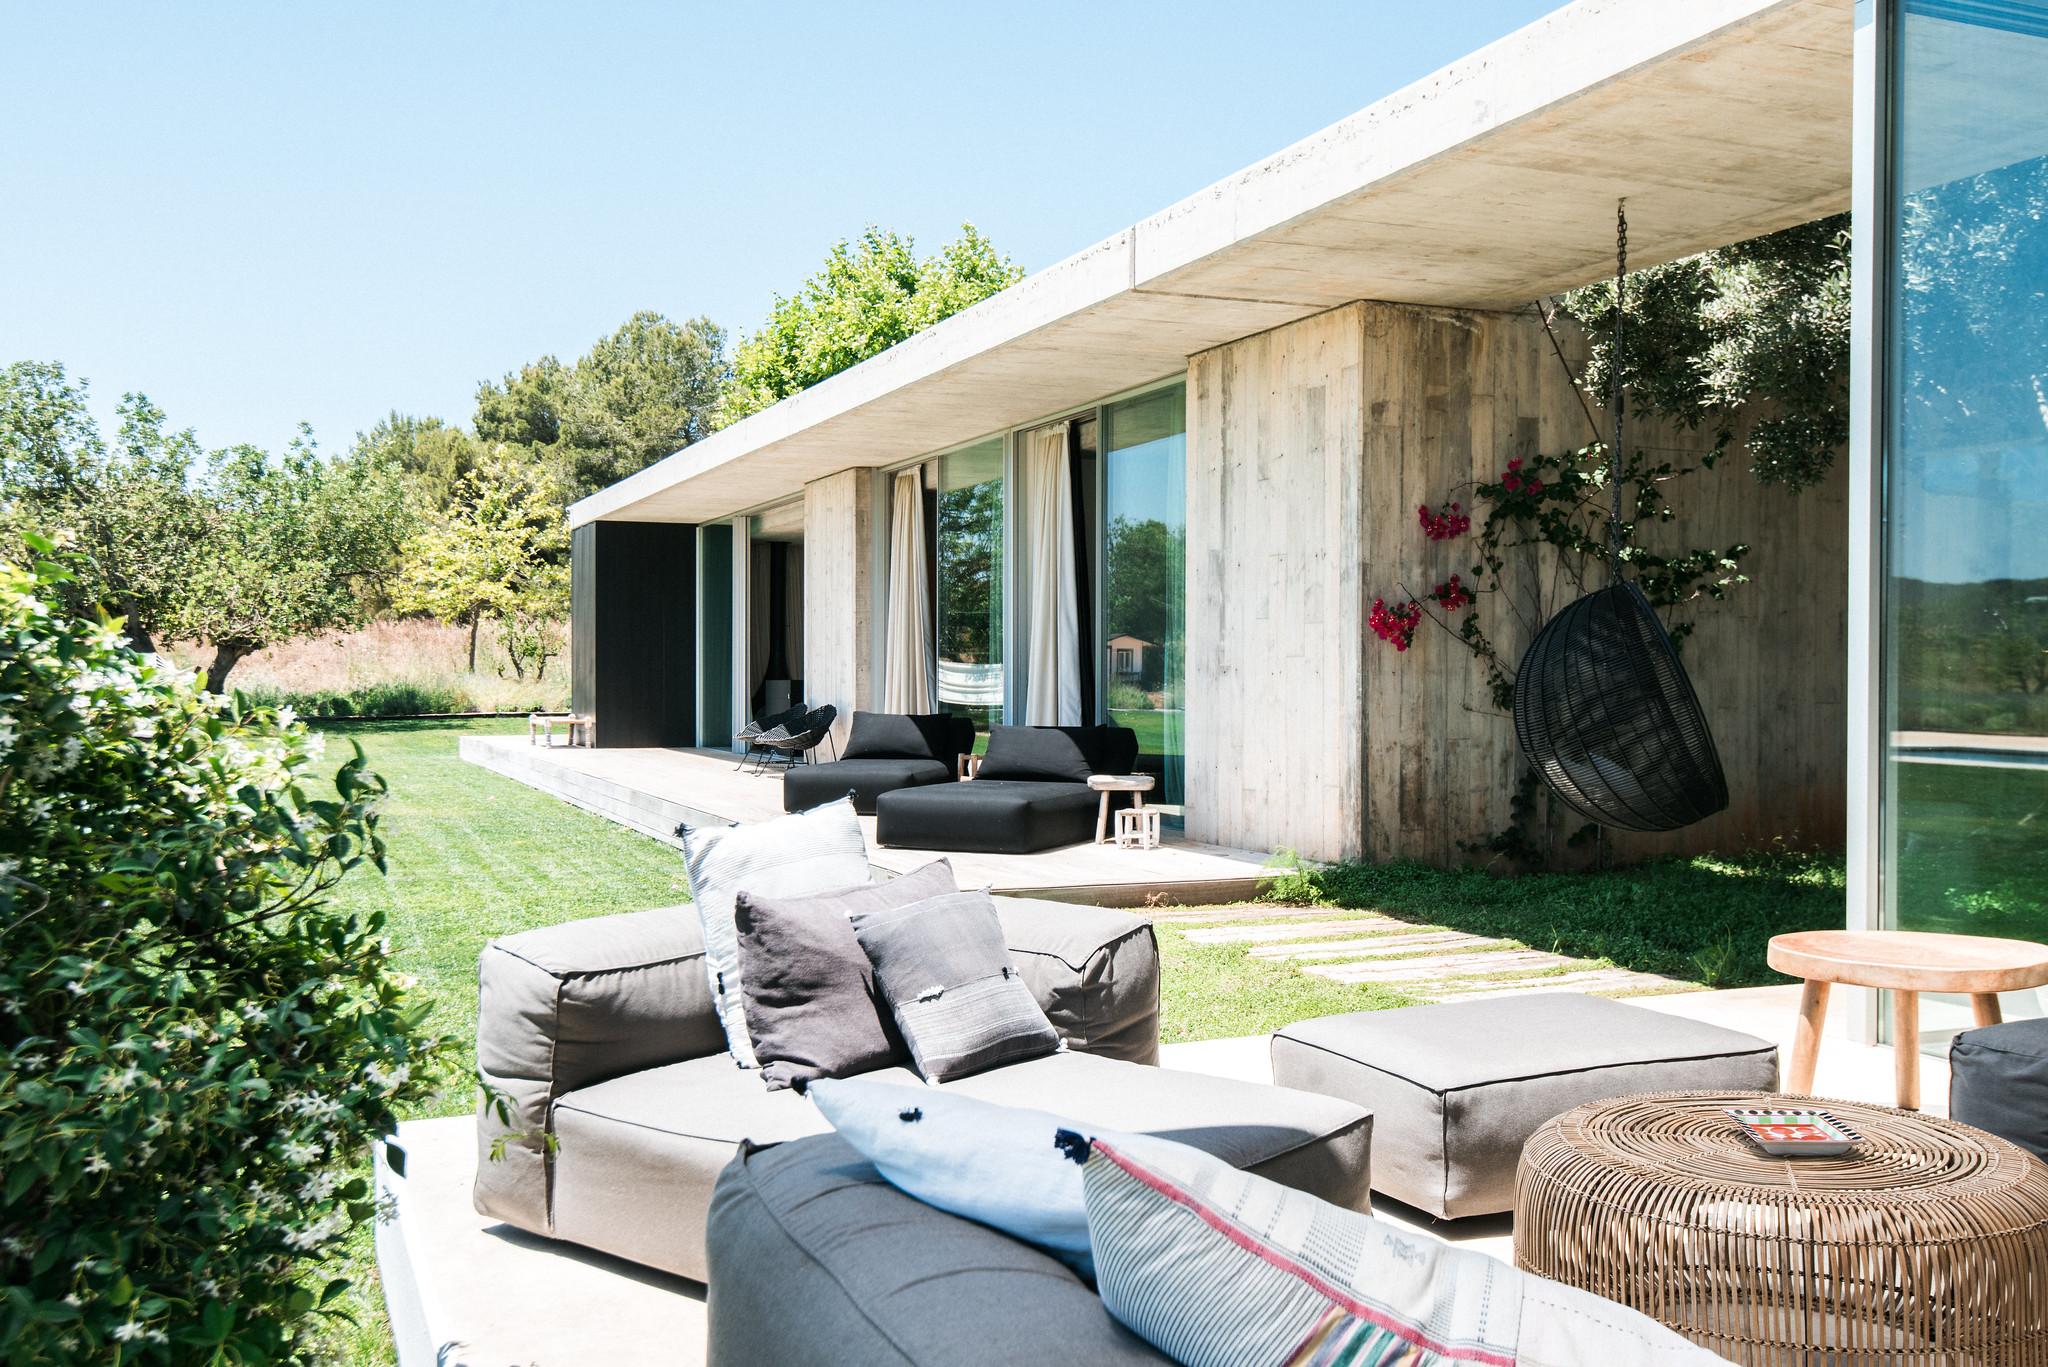 https://www.white-ibiza.com/wp-content/uploads/2020/06/white-ibiza-villas-casa-valentina-exterior-outside-seating.jpg